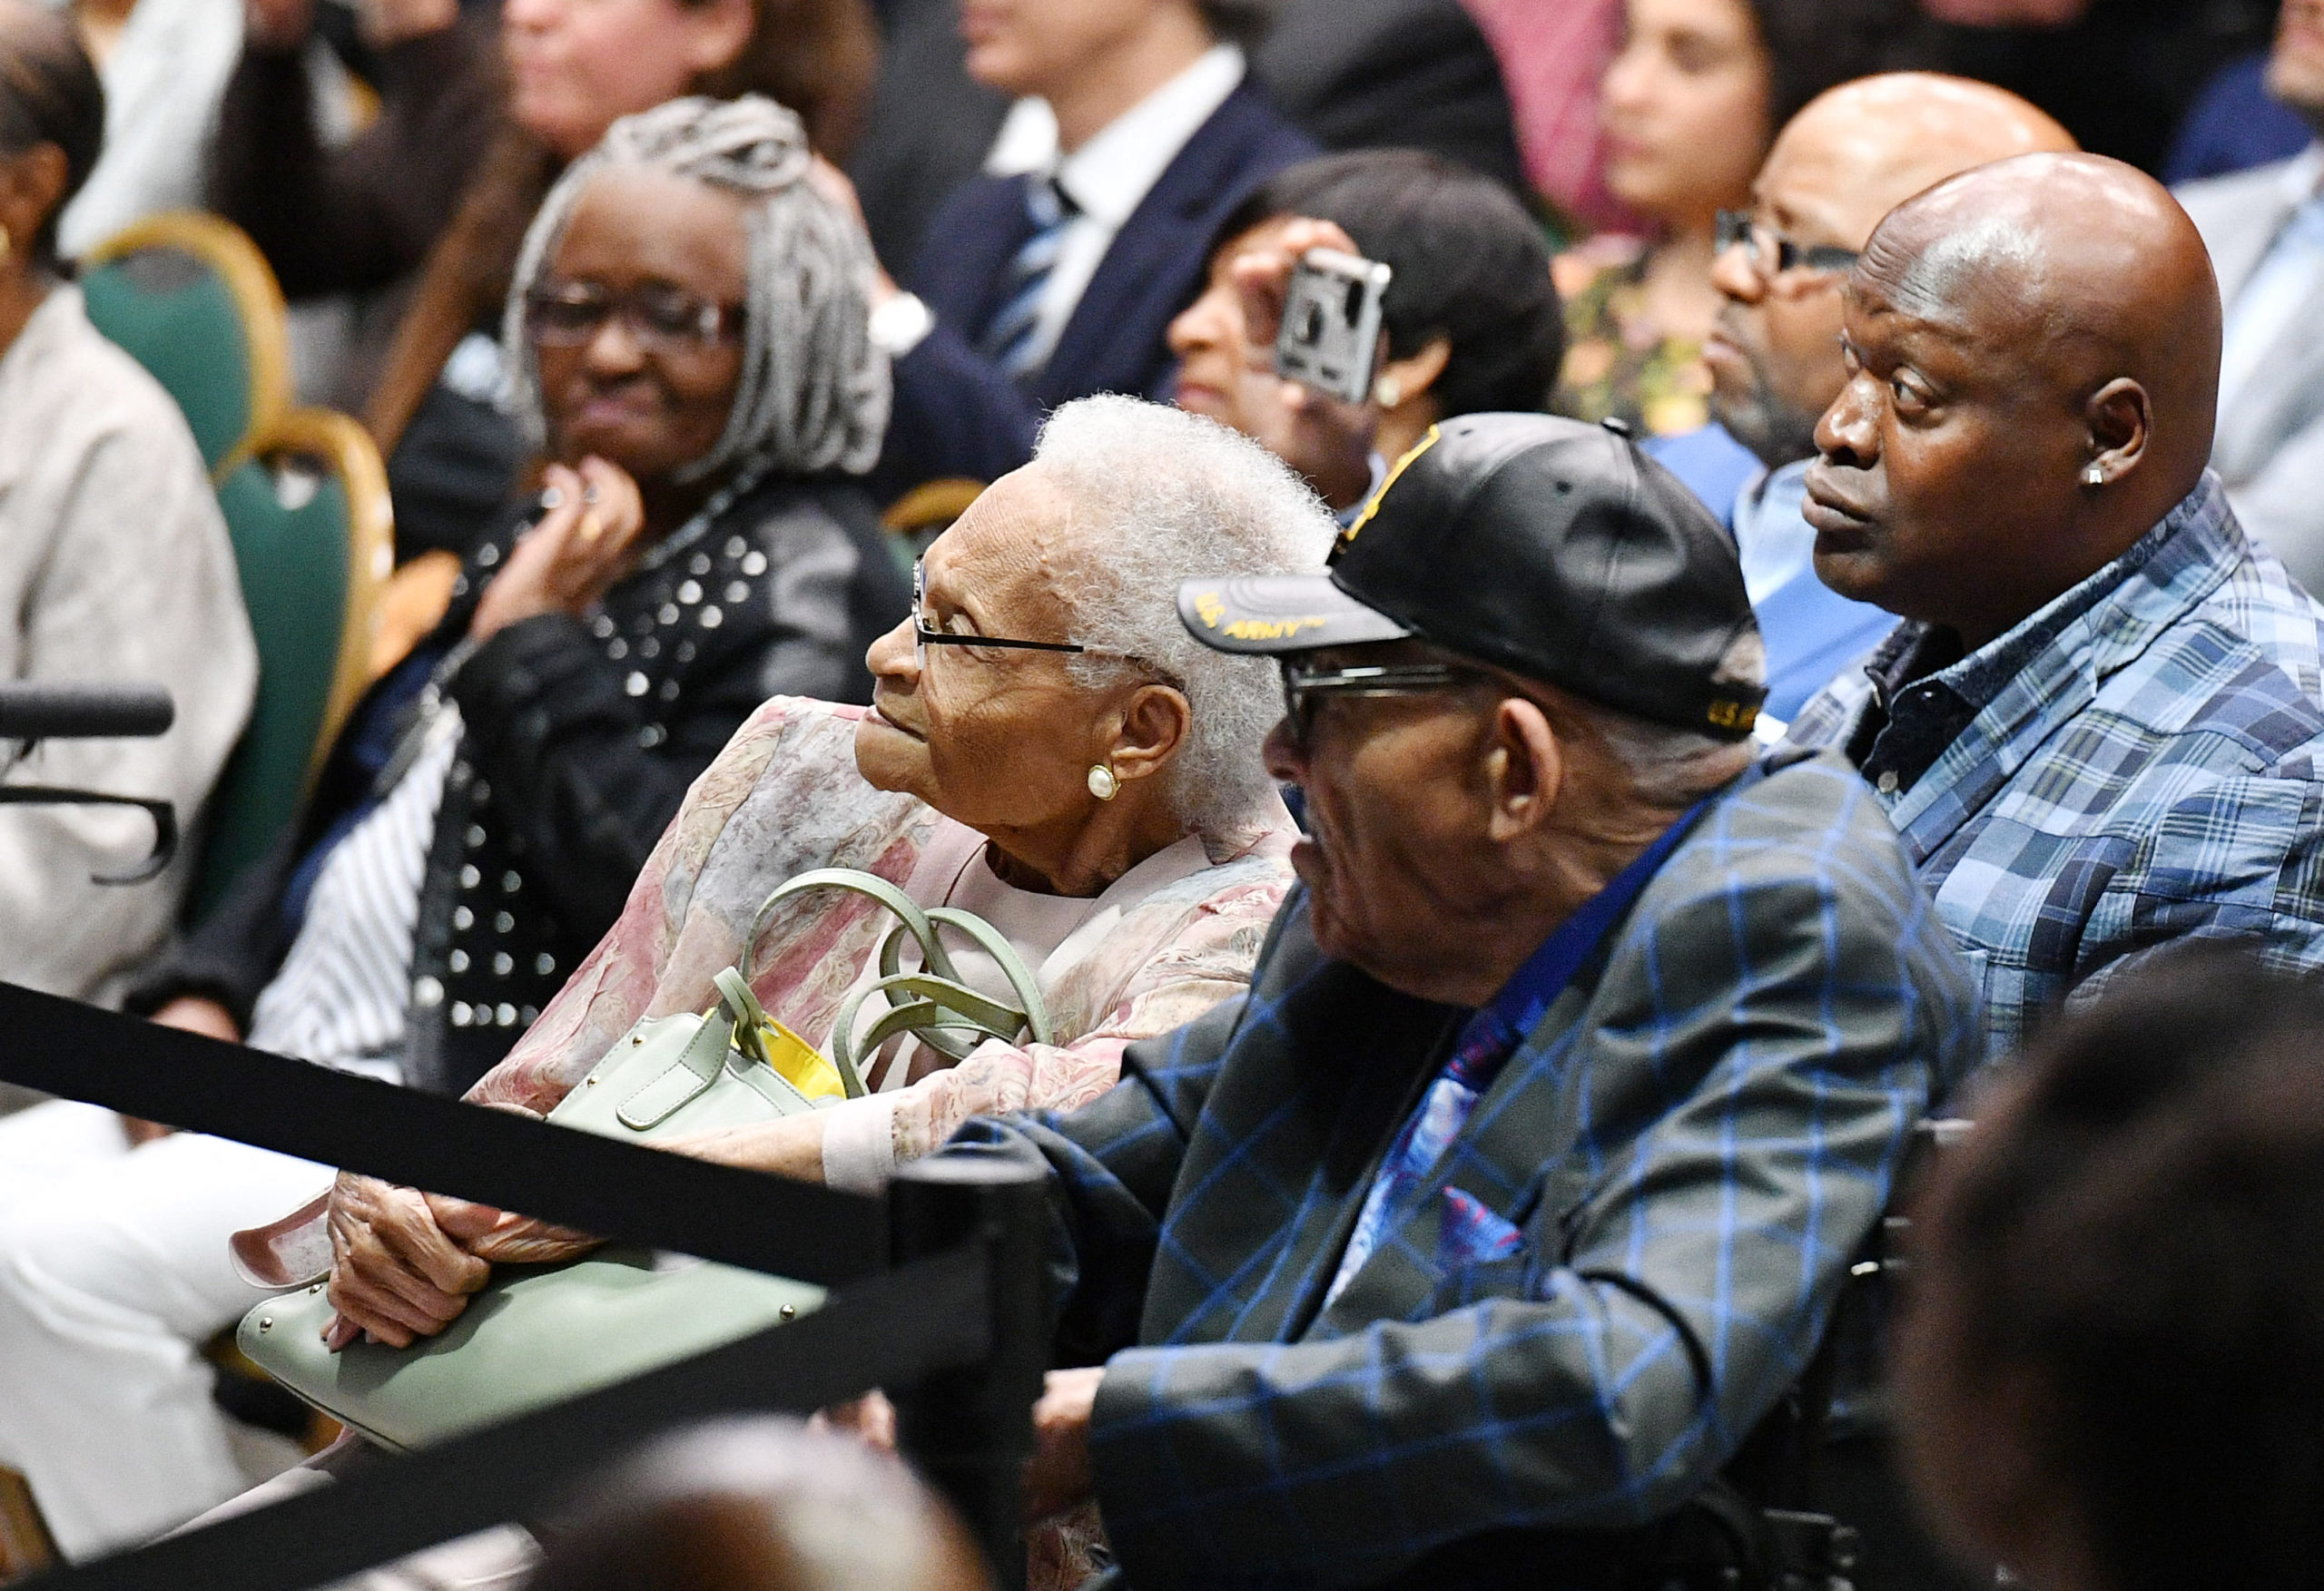 Tulsa race massacre Survivors Viola Fletcher (C) and Hughes Van Ellis (C R) listen to US President Joe Biden as he speaks on the 100th anniversary of the Tulsa Race Massacre at the Greenwood Cultural Center in Tulsa, Oklahoma on June 1, 2021. (MANDEL NGAN/AFP via Getty Images)